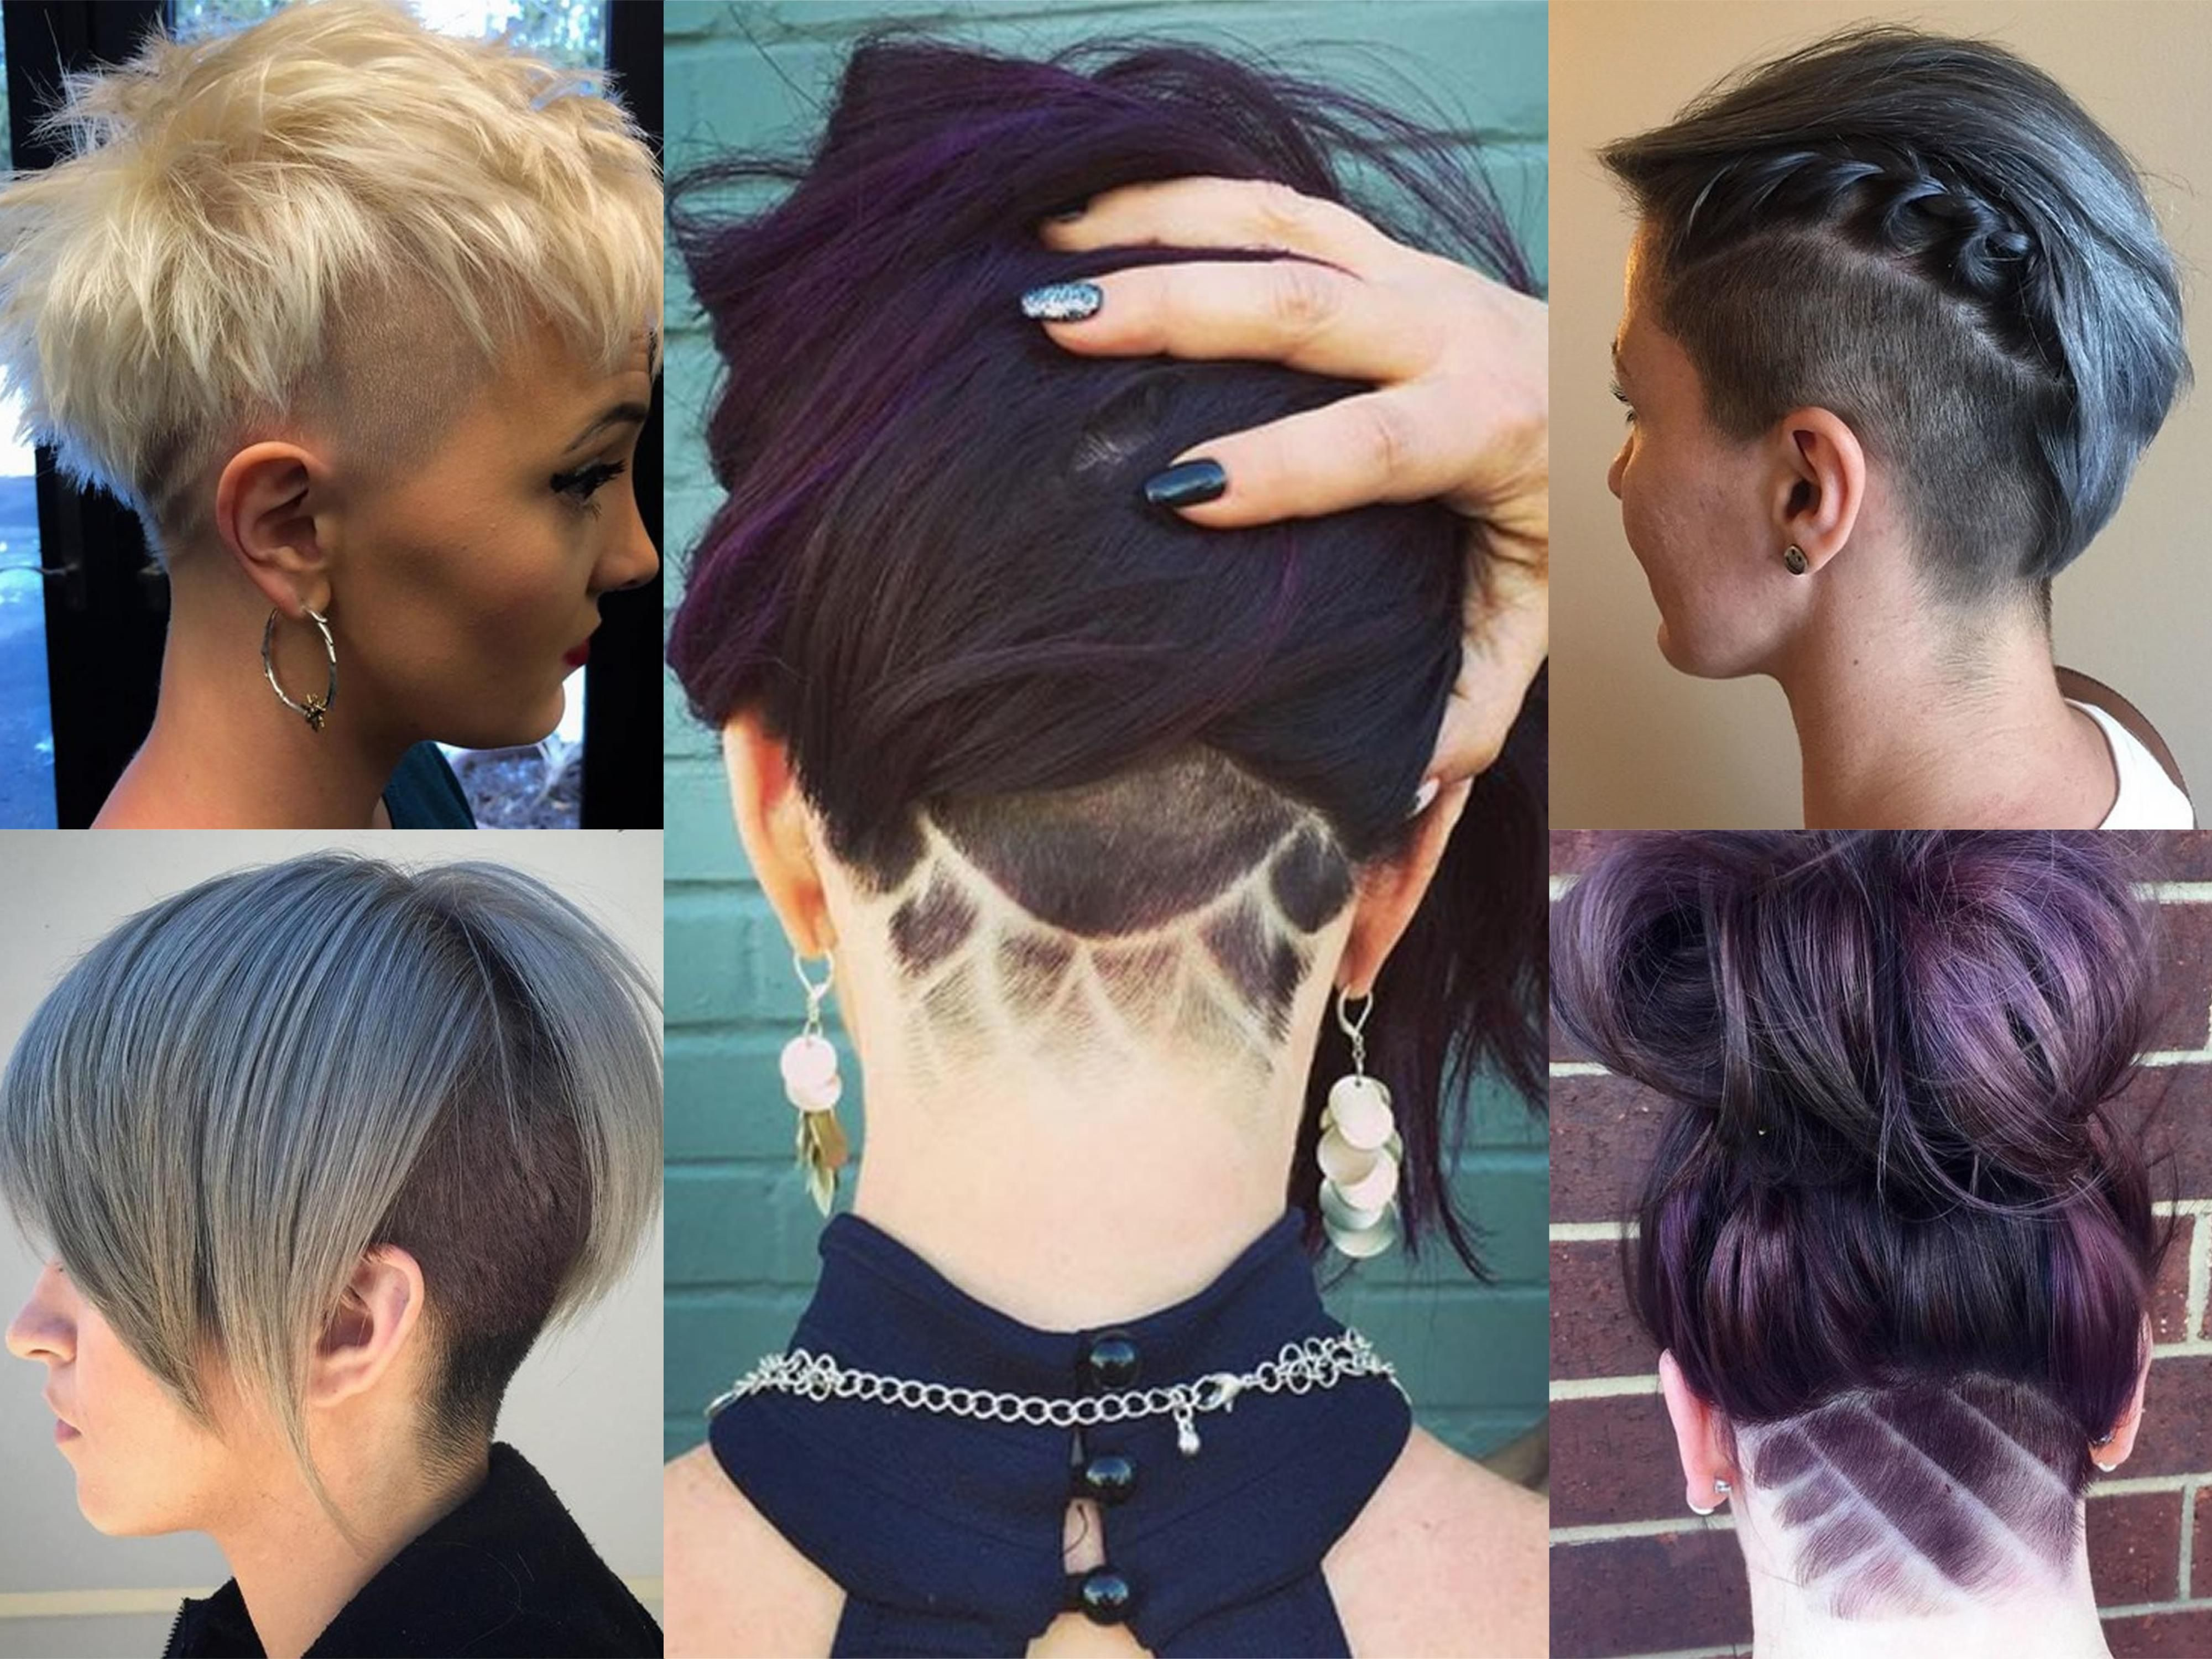 Frisuren Fur Damen Frisuren Stil Haar Kurze Und Lange Frisuren Frisuren Lange Haare Manner Kurzhaarfrisuren Coole Frisuren Lange Haare